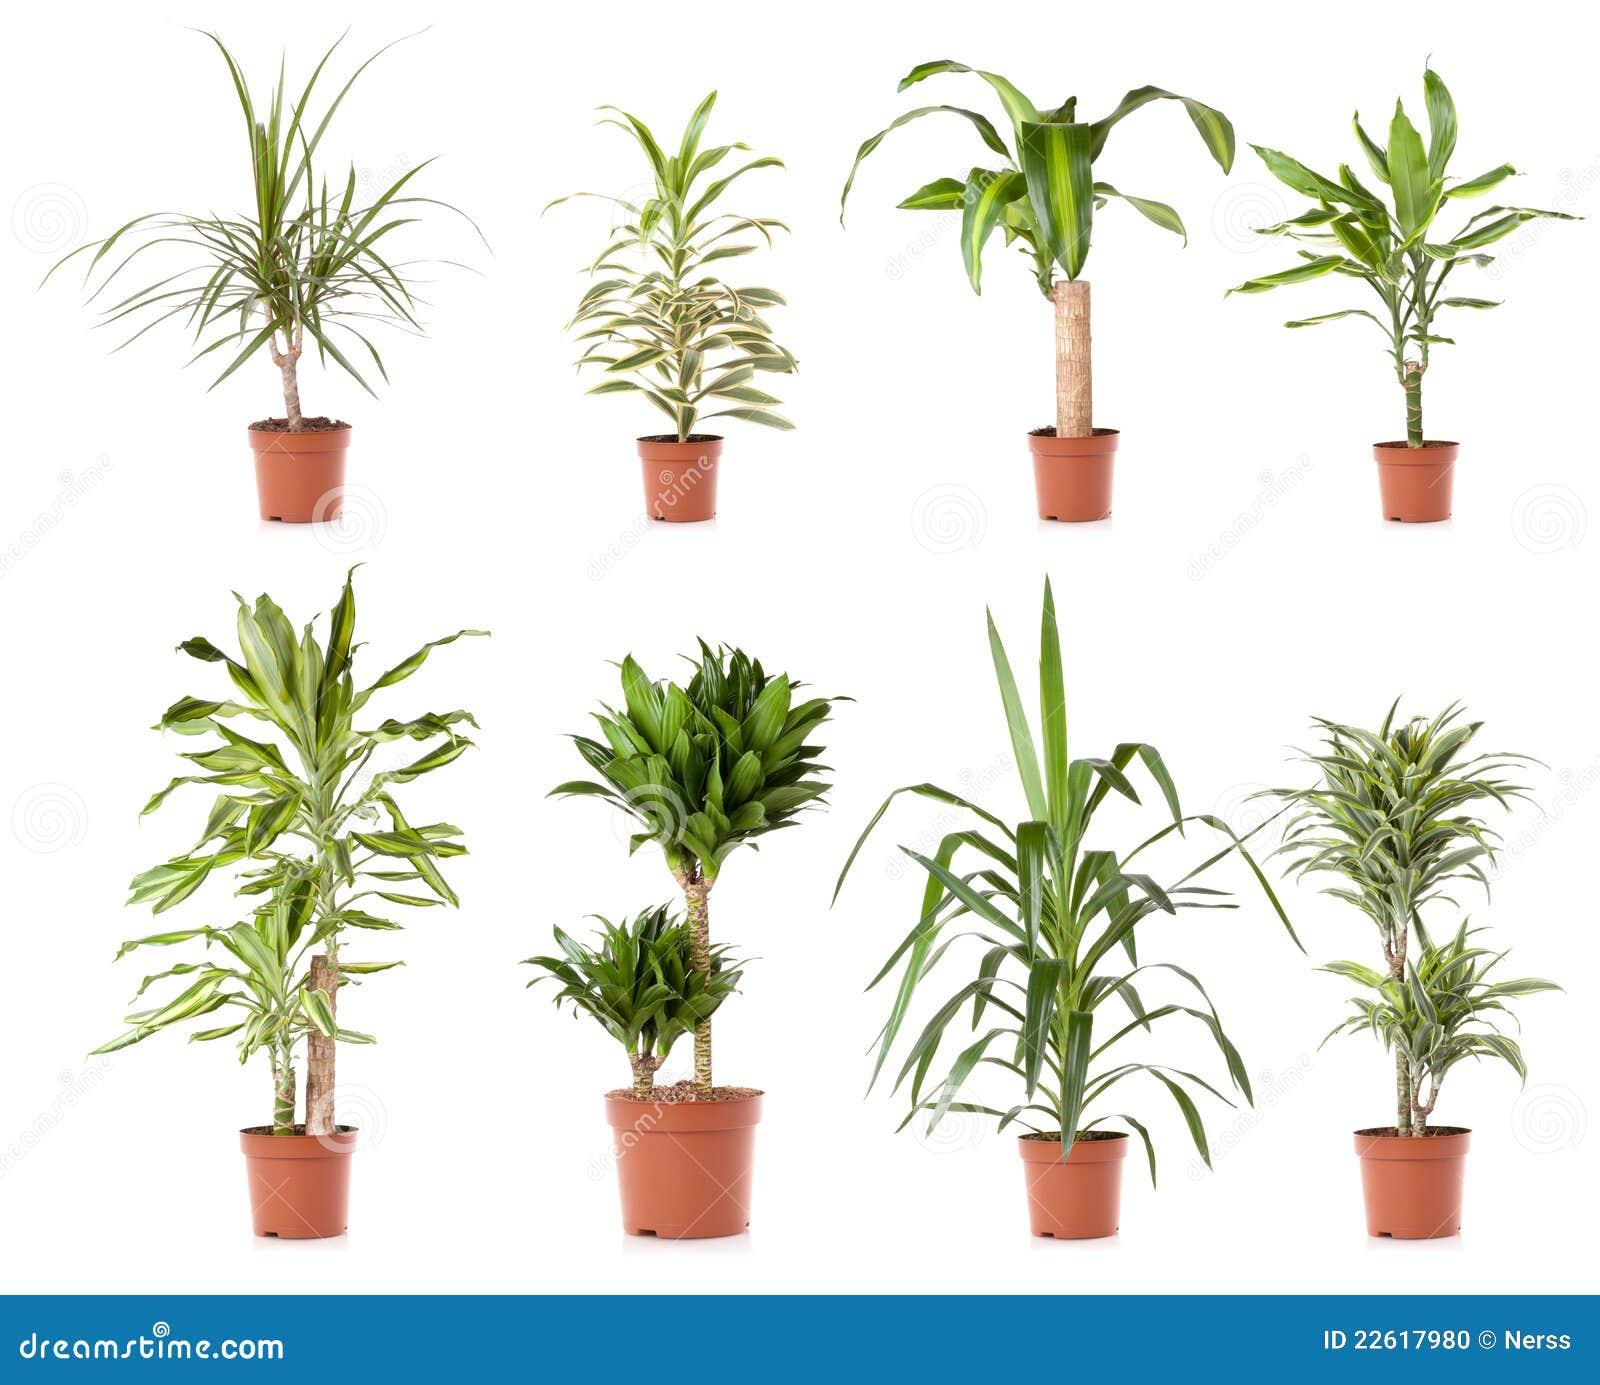 Pot plant tree